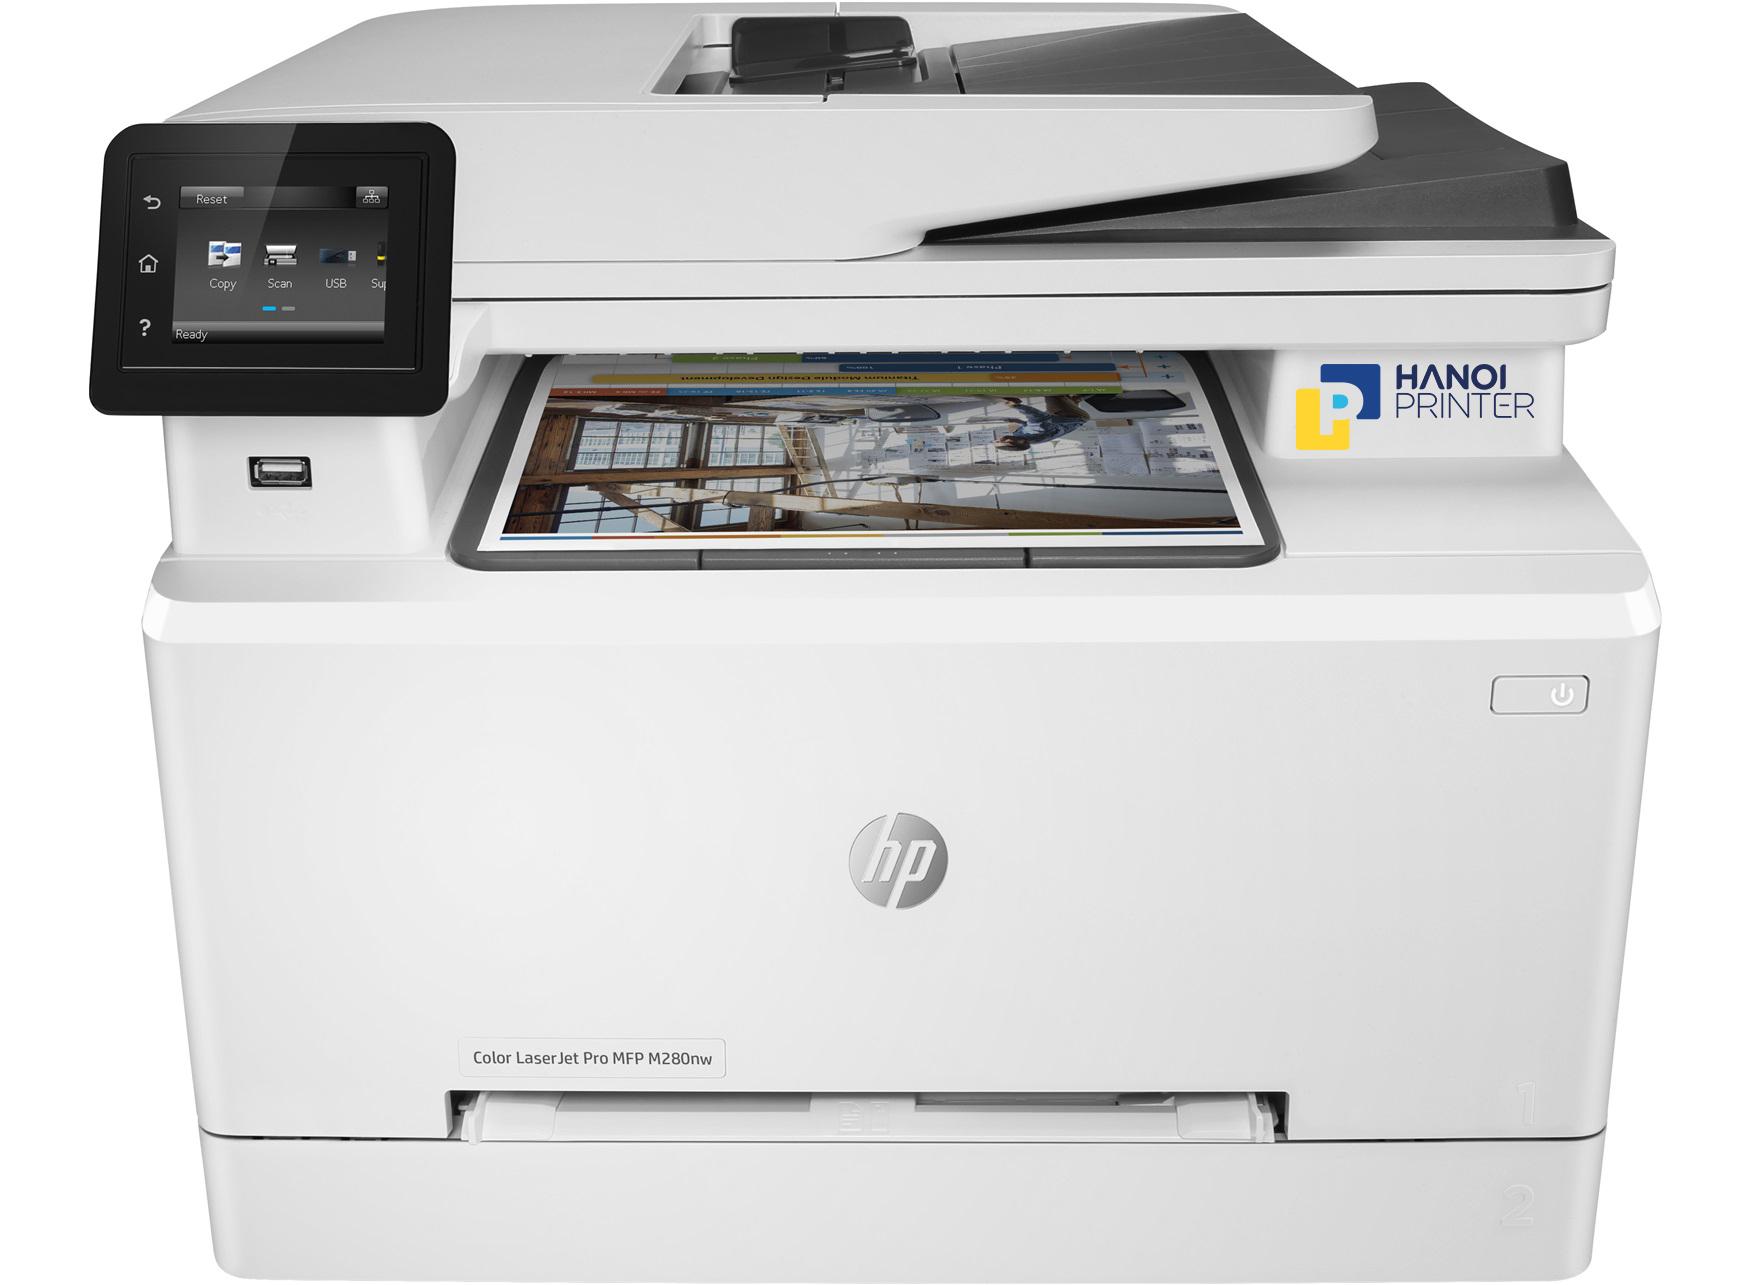 Máy in Laser màu đa năng HP LaserJet Pro MFP M280nw